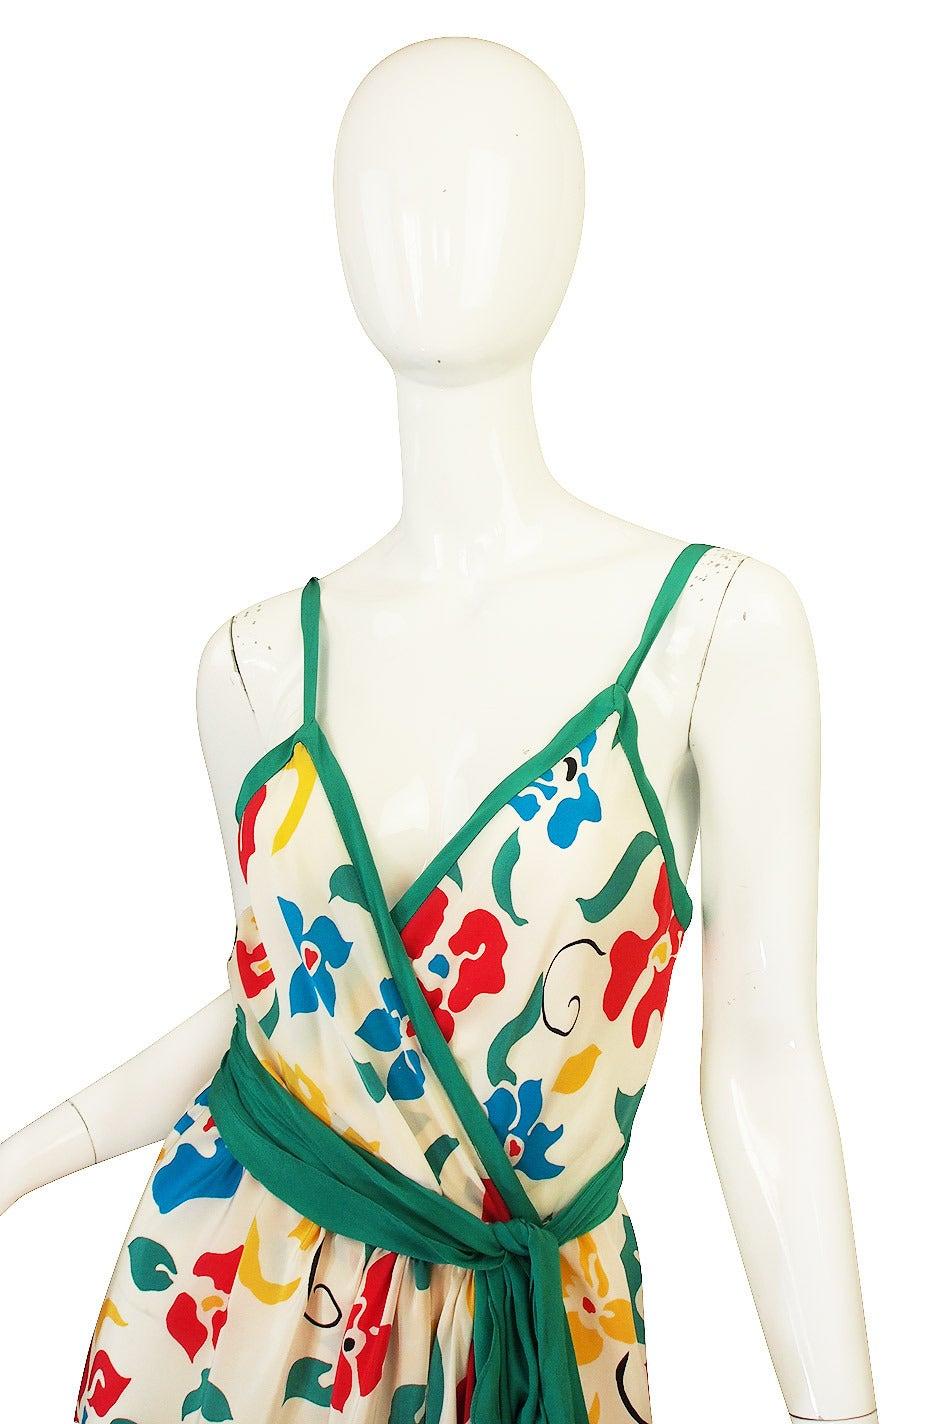 1979 Oscar De La Renta Dress as Seen in Vogue 4